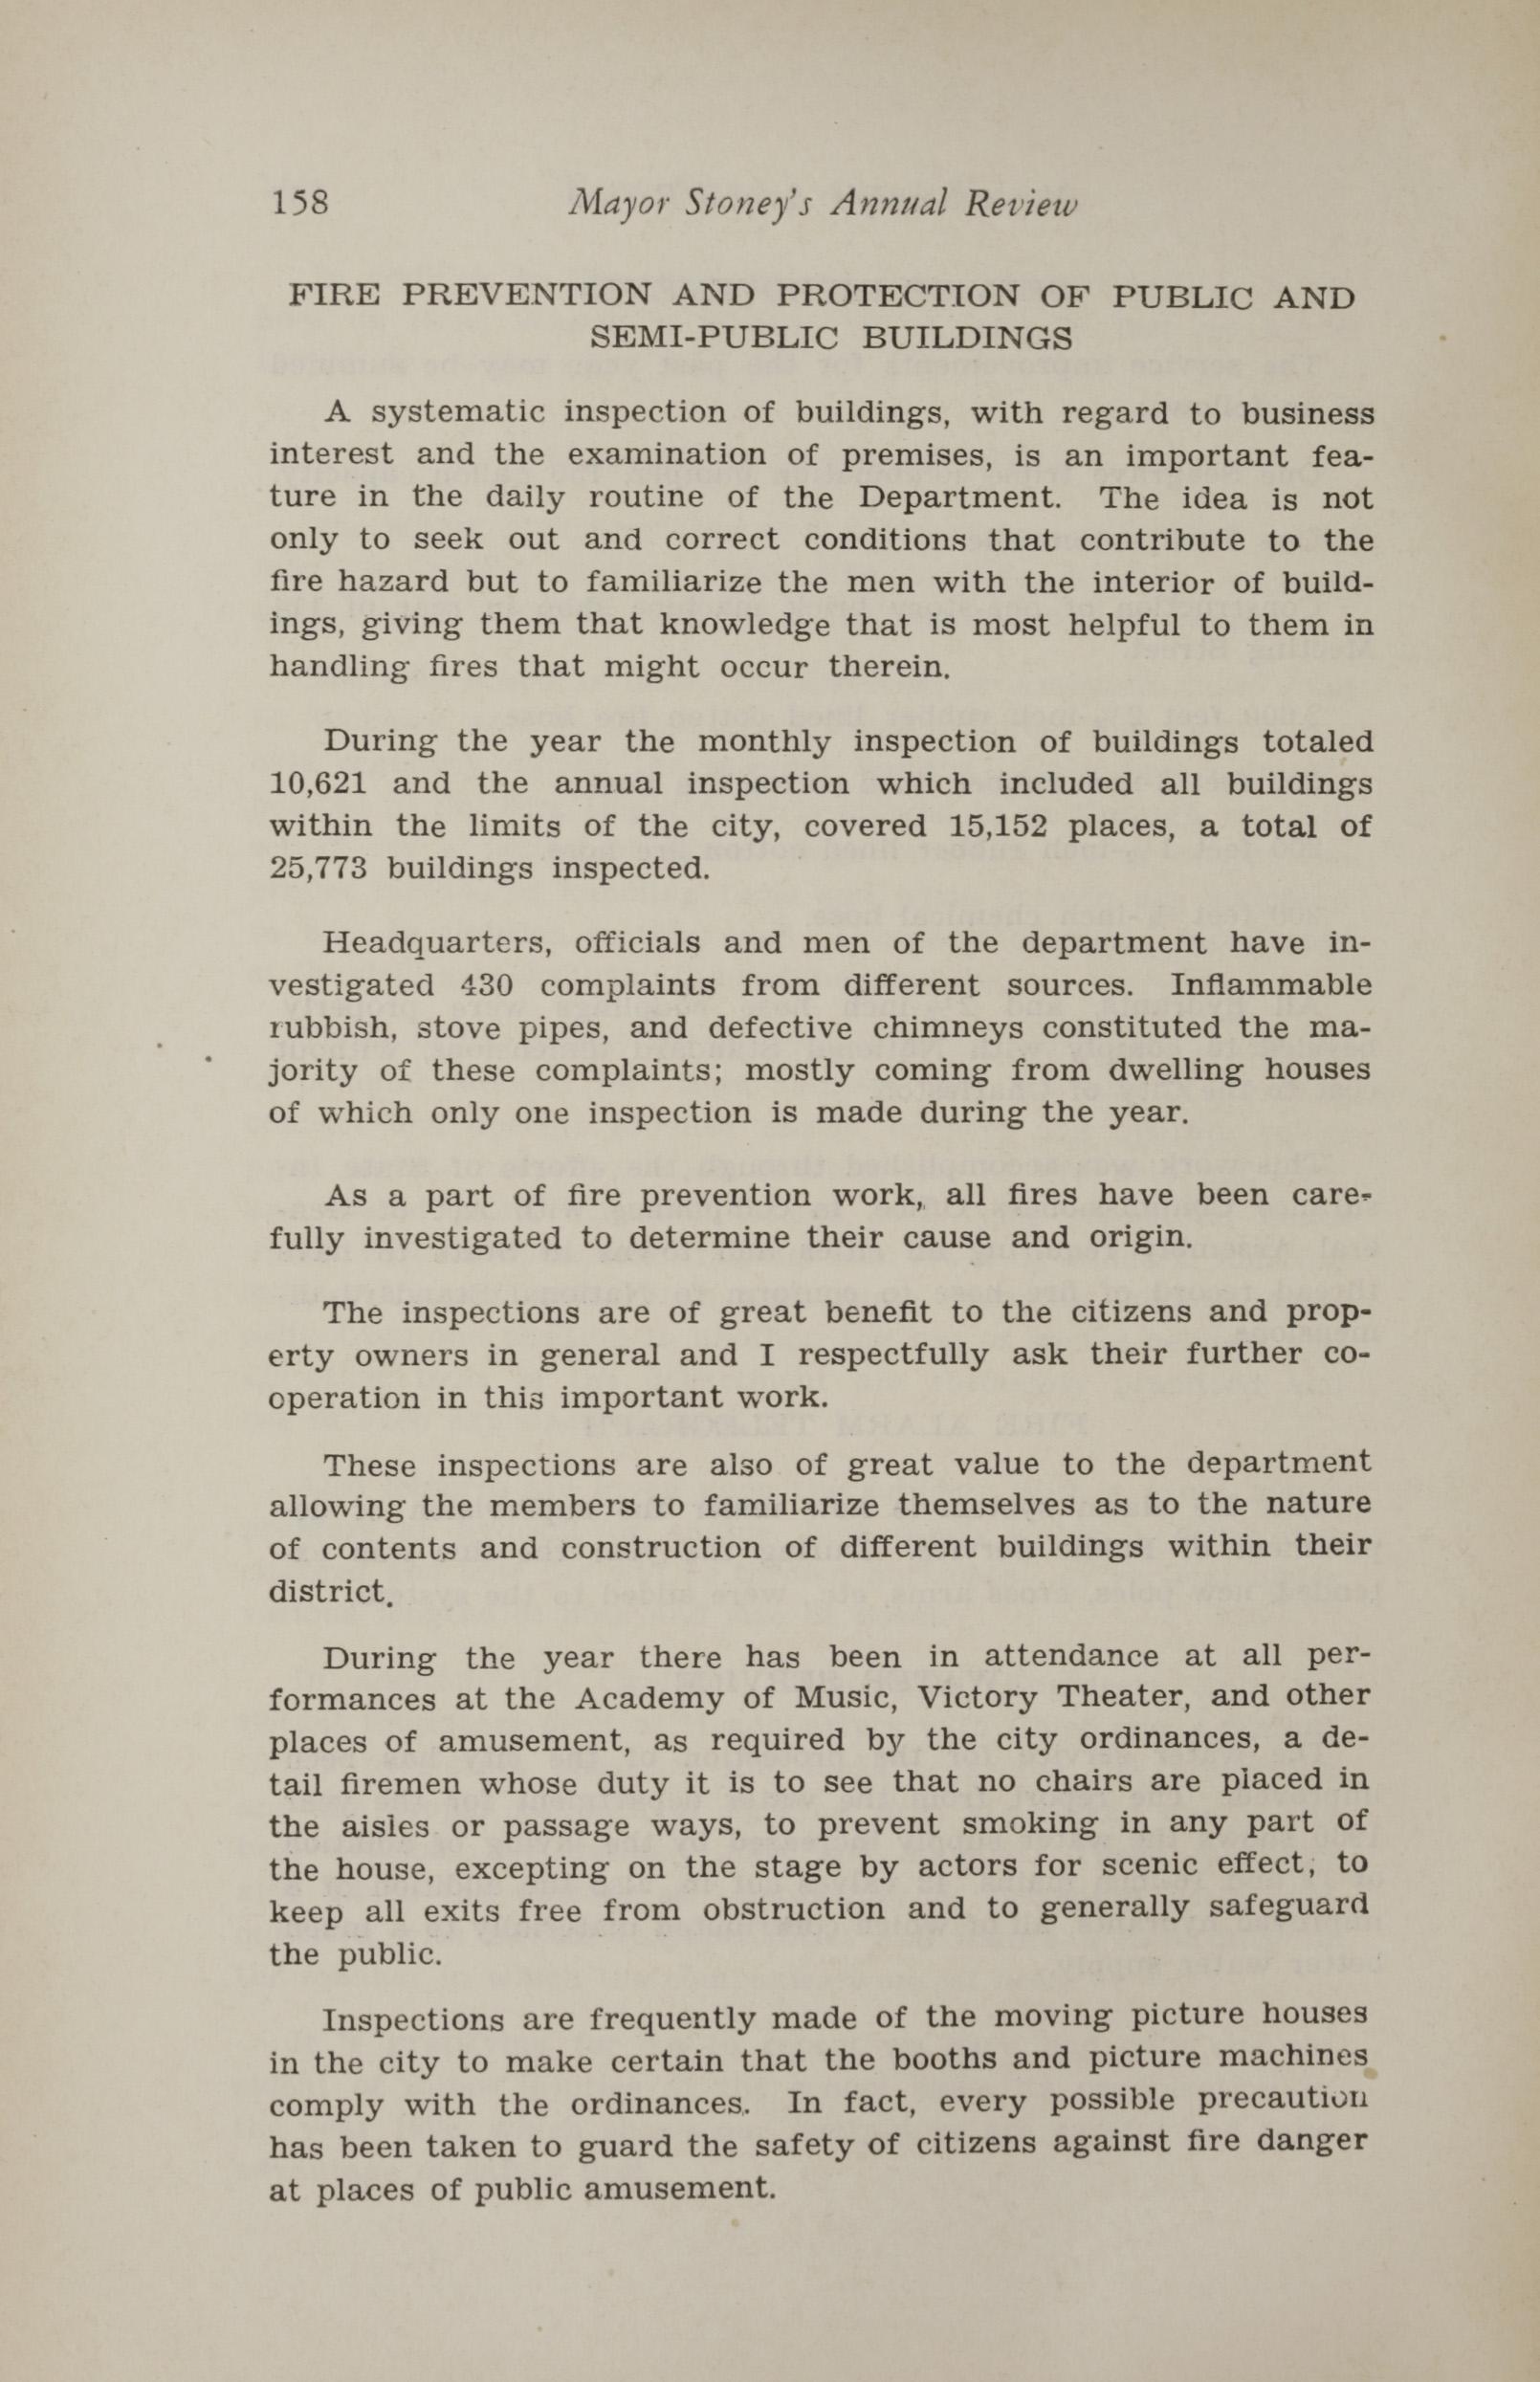 Charleston Yearbook, 1930, page 158